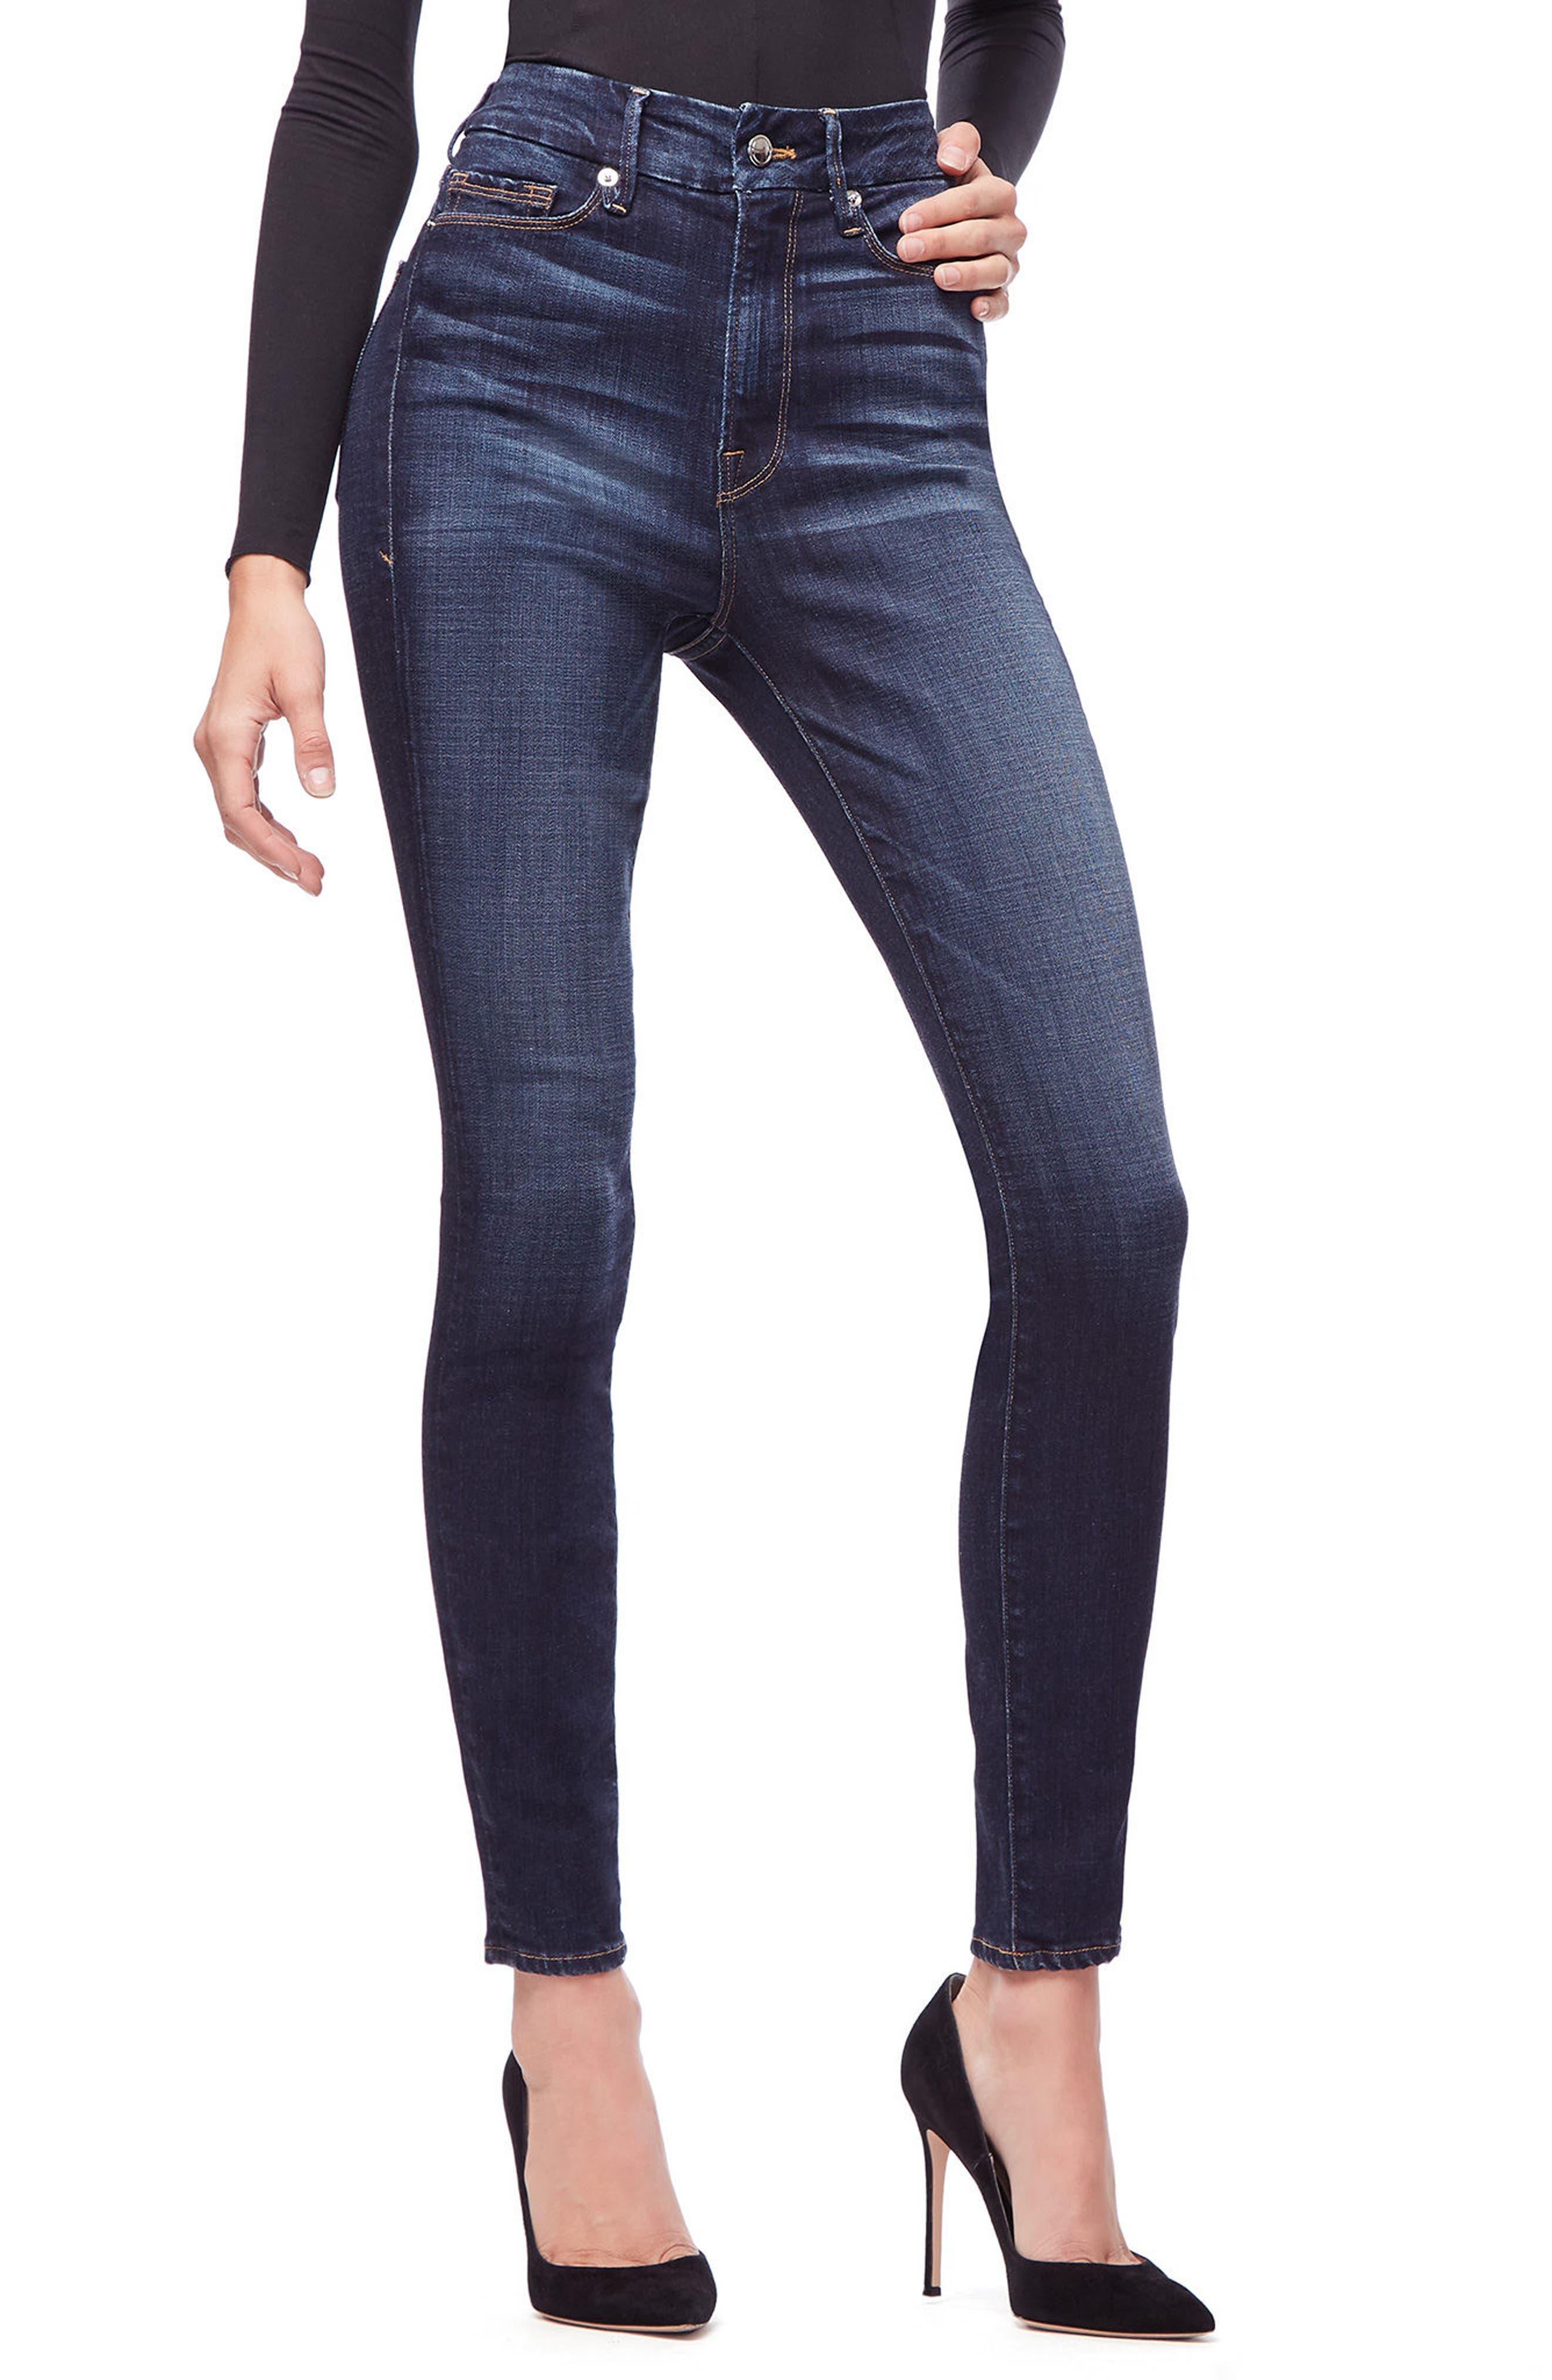 GOOD AMERICAN,                             Good Legs High Waist Skinny Jeans,                             Main thumbnail 1, color,                             401